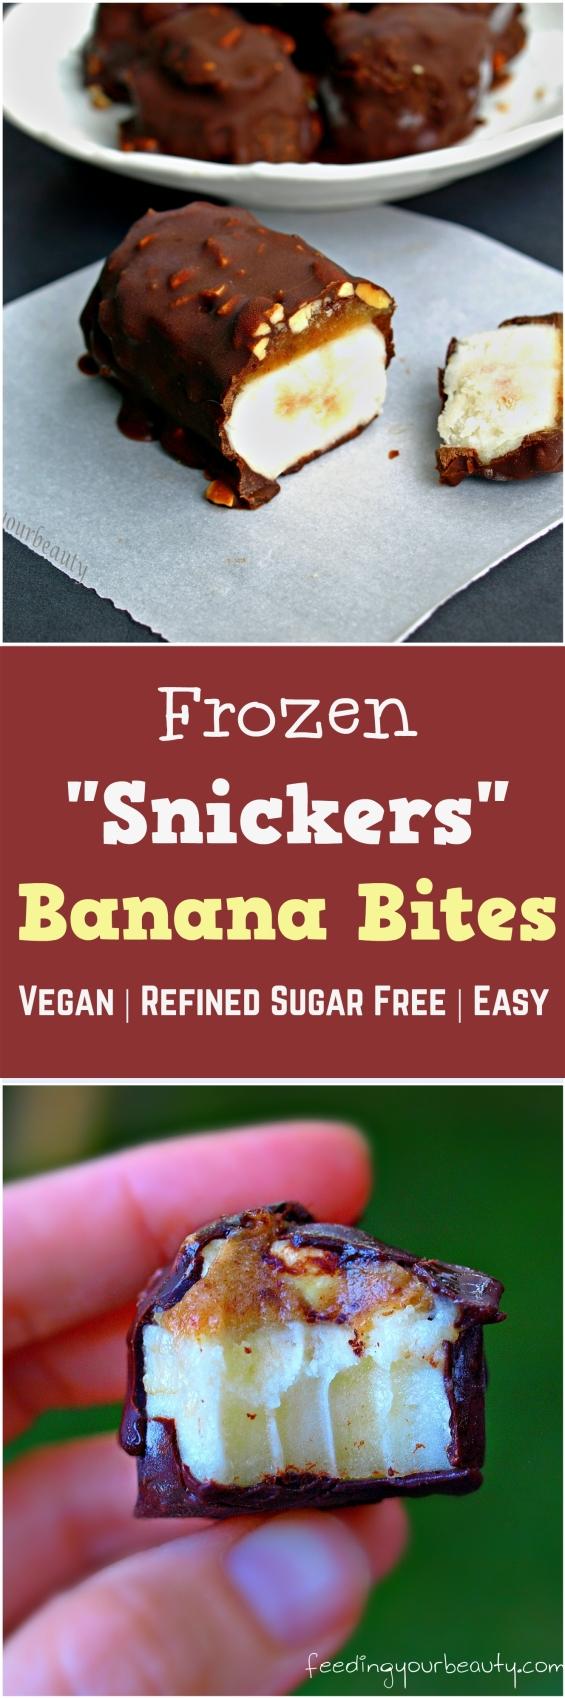 snickers banana bites